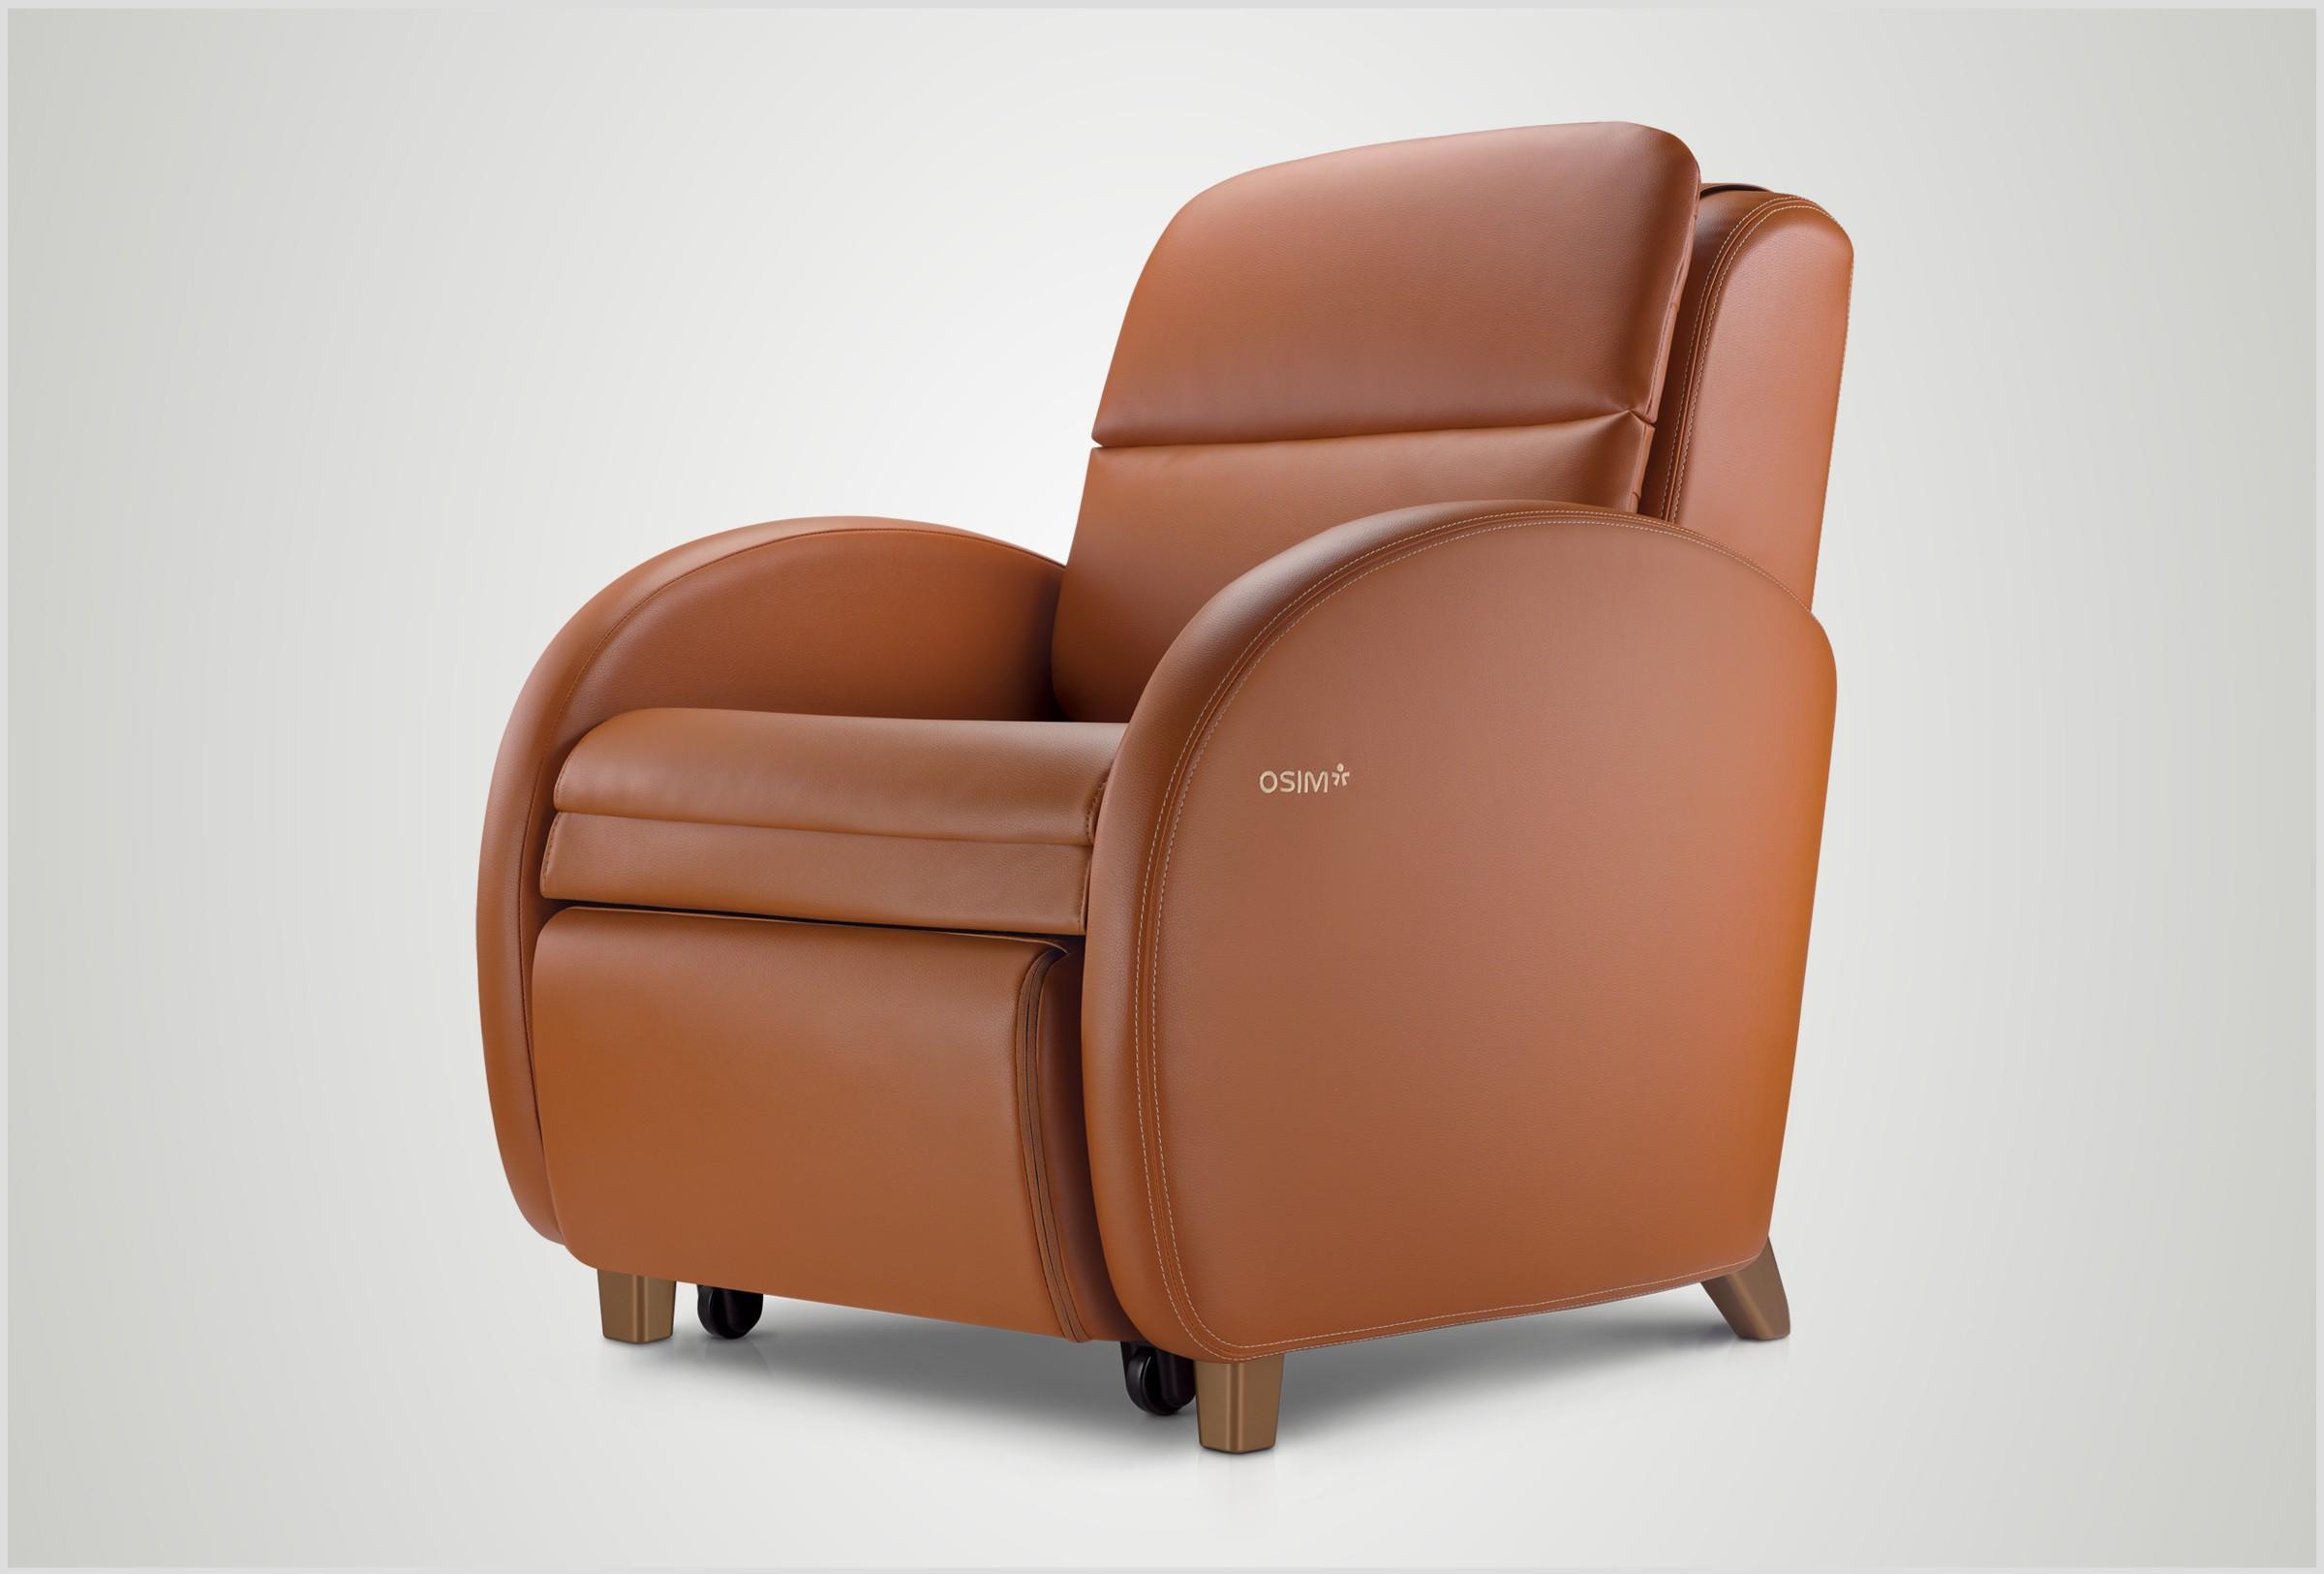 Osim Massage Chair Models - Udiva classic massage sofa